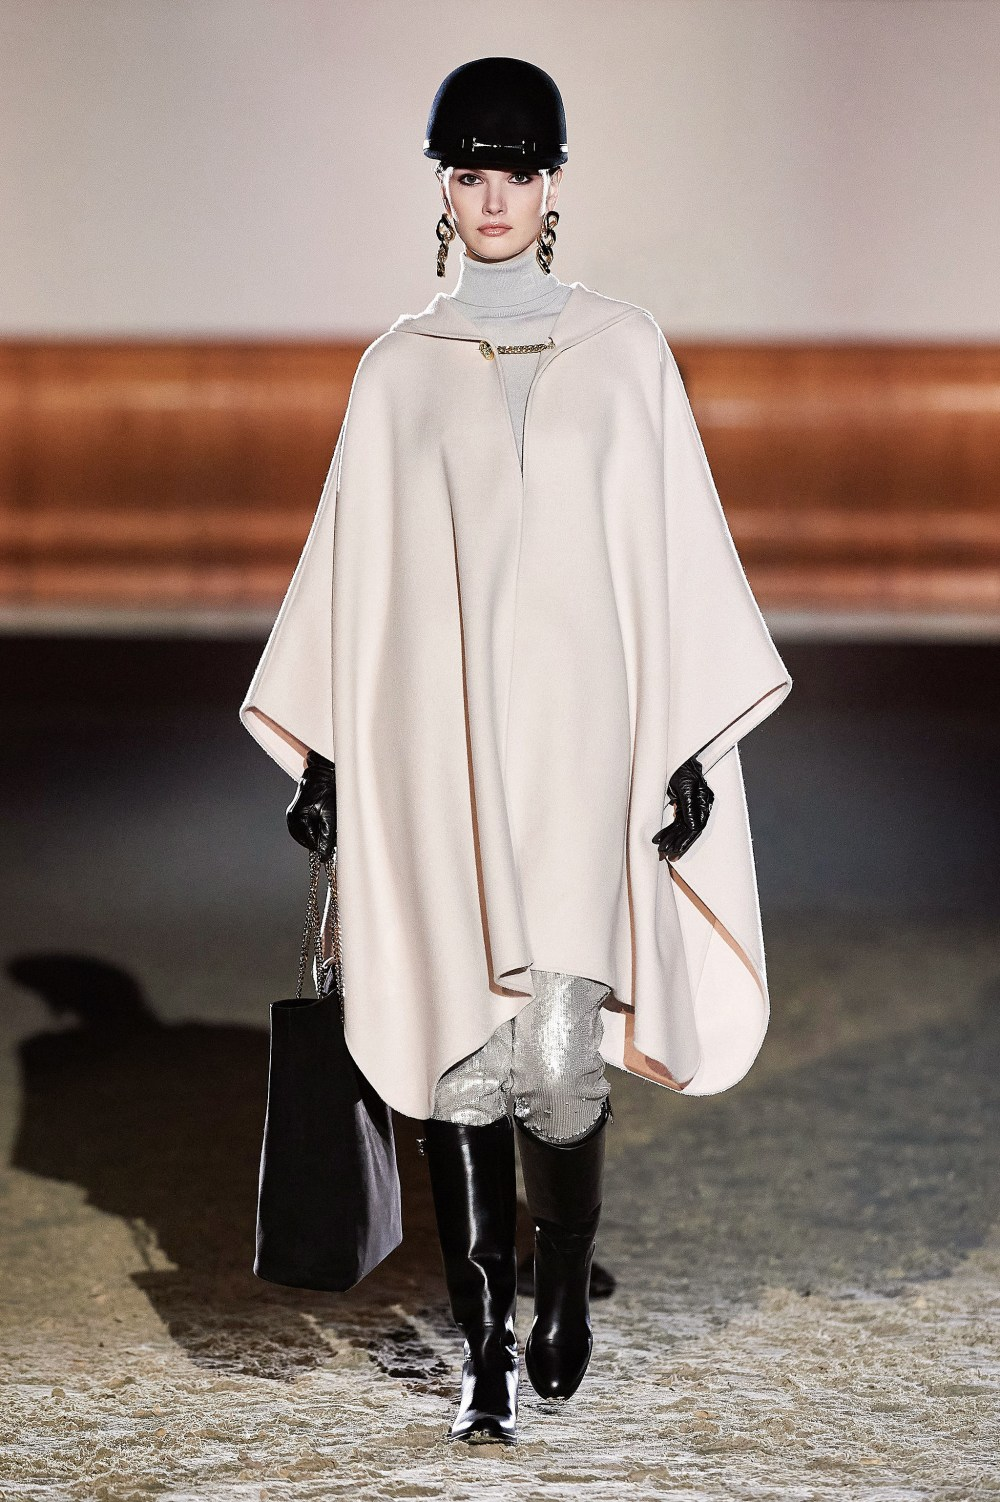 Elisabetta Franchi: Elisabetta Franchi Fall Winter 2021-22 Fashion Show Photo #28